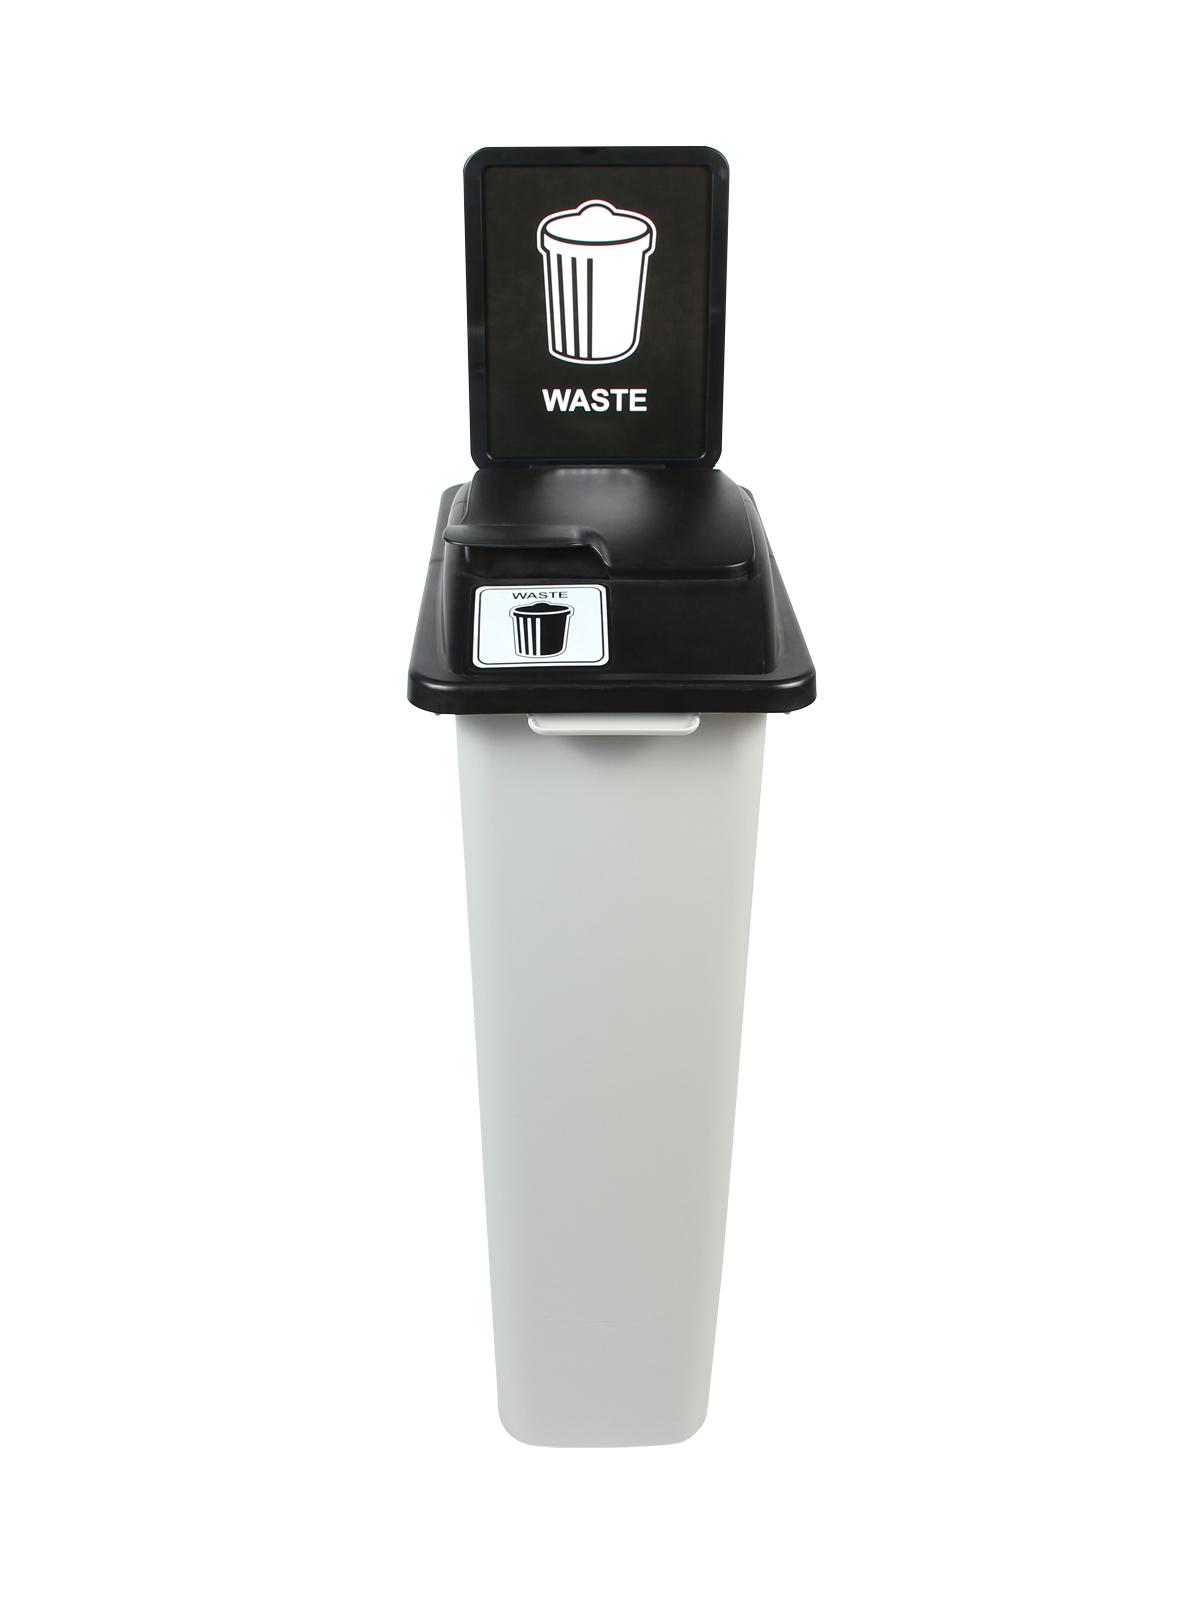 WASTE WATCHER - Single - Waste - Solid Lift - Grey-Black